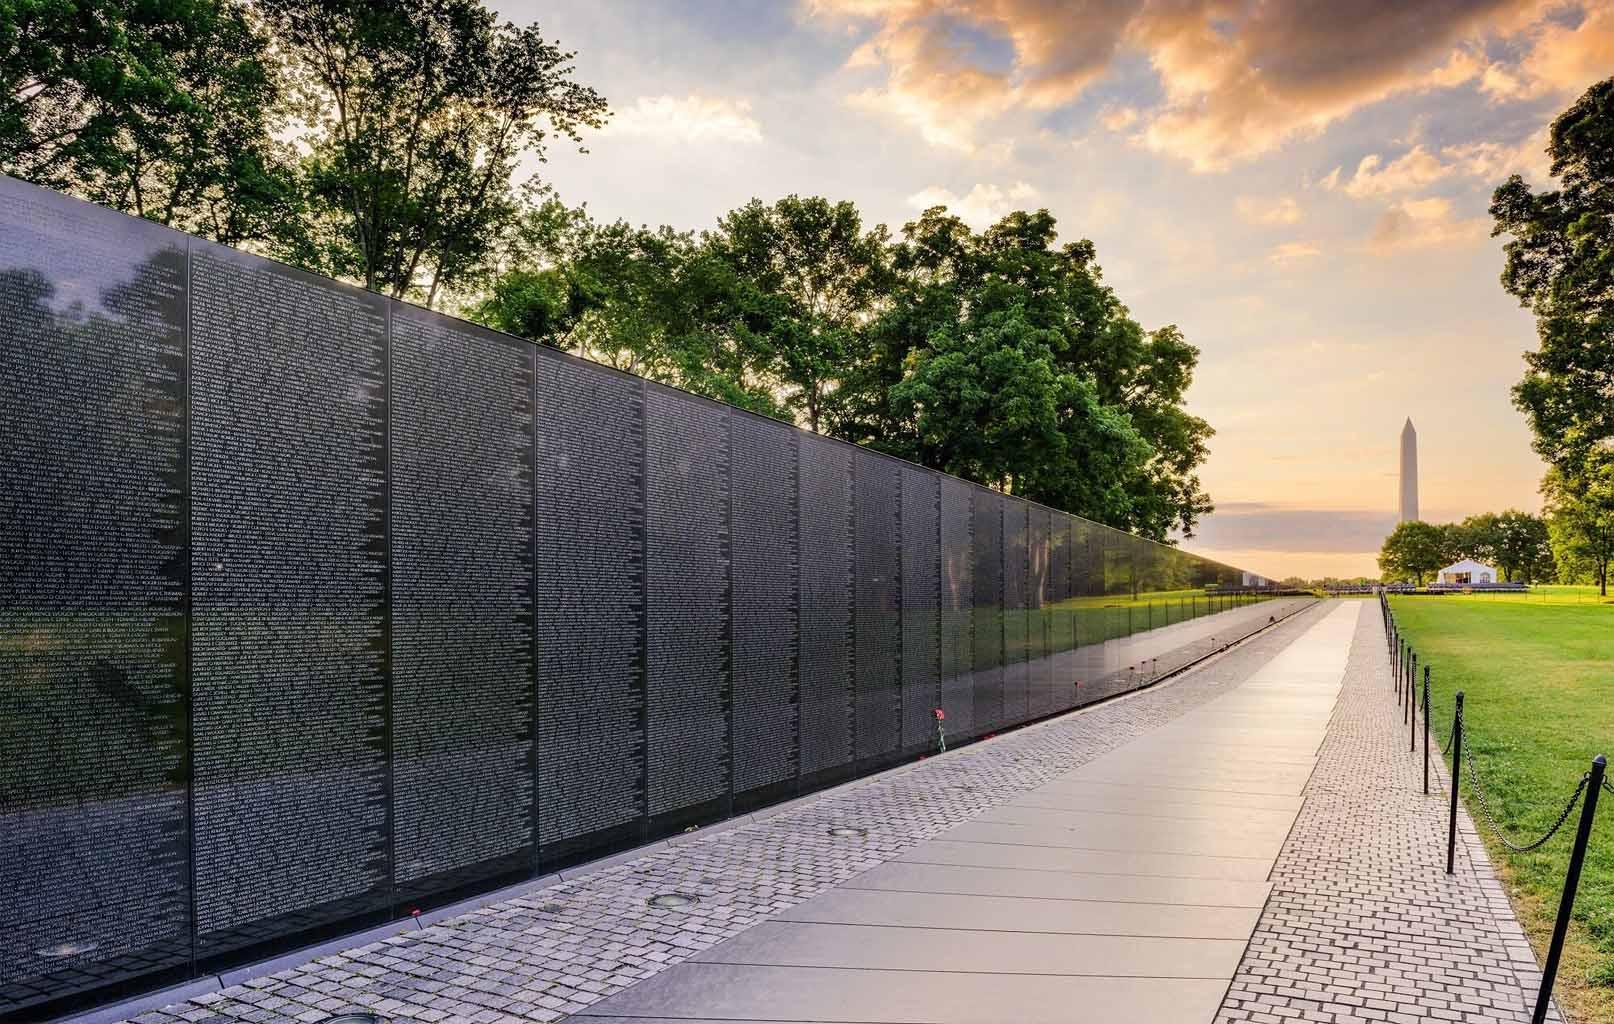 Black Wall - Vietnam Veterans Memorial - Bức tường chiến tranh Việt Nam